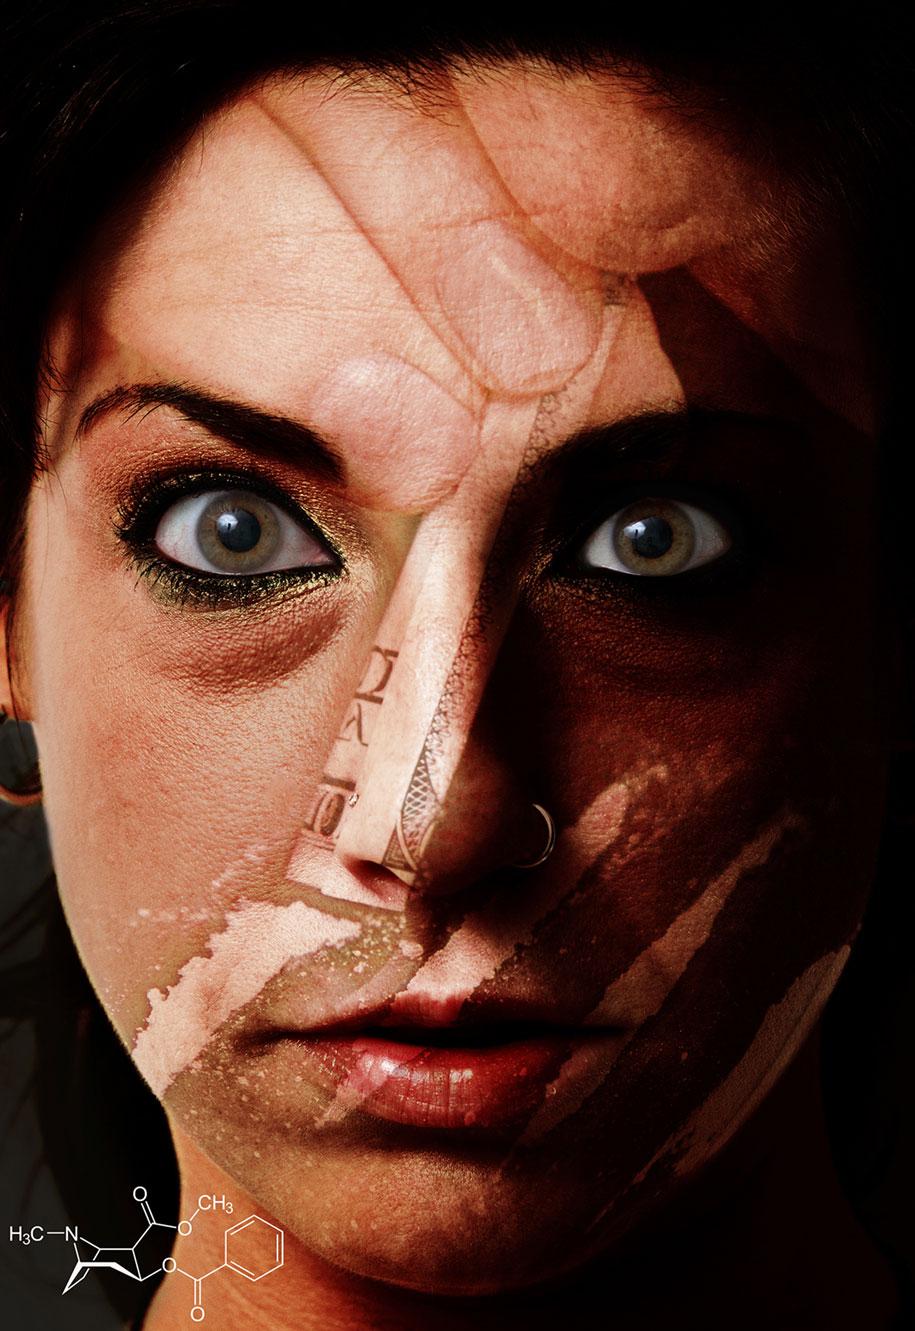 people-using-drugs-portraits-inebrination-les-baker-v-13